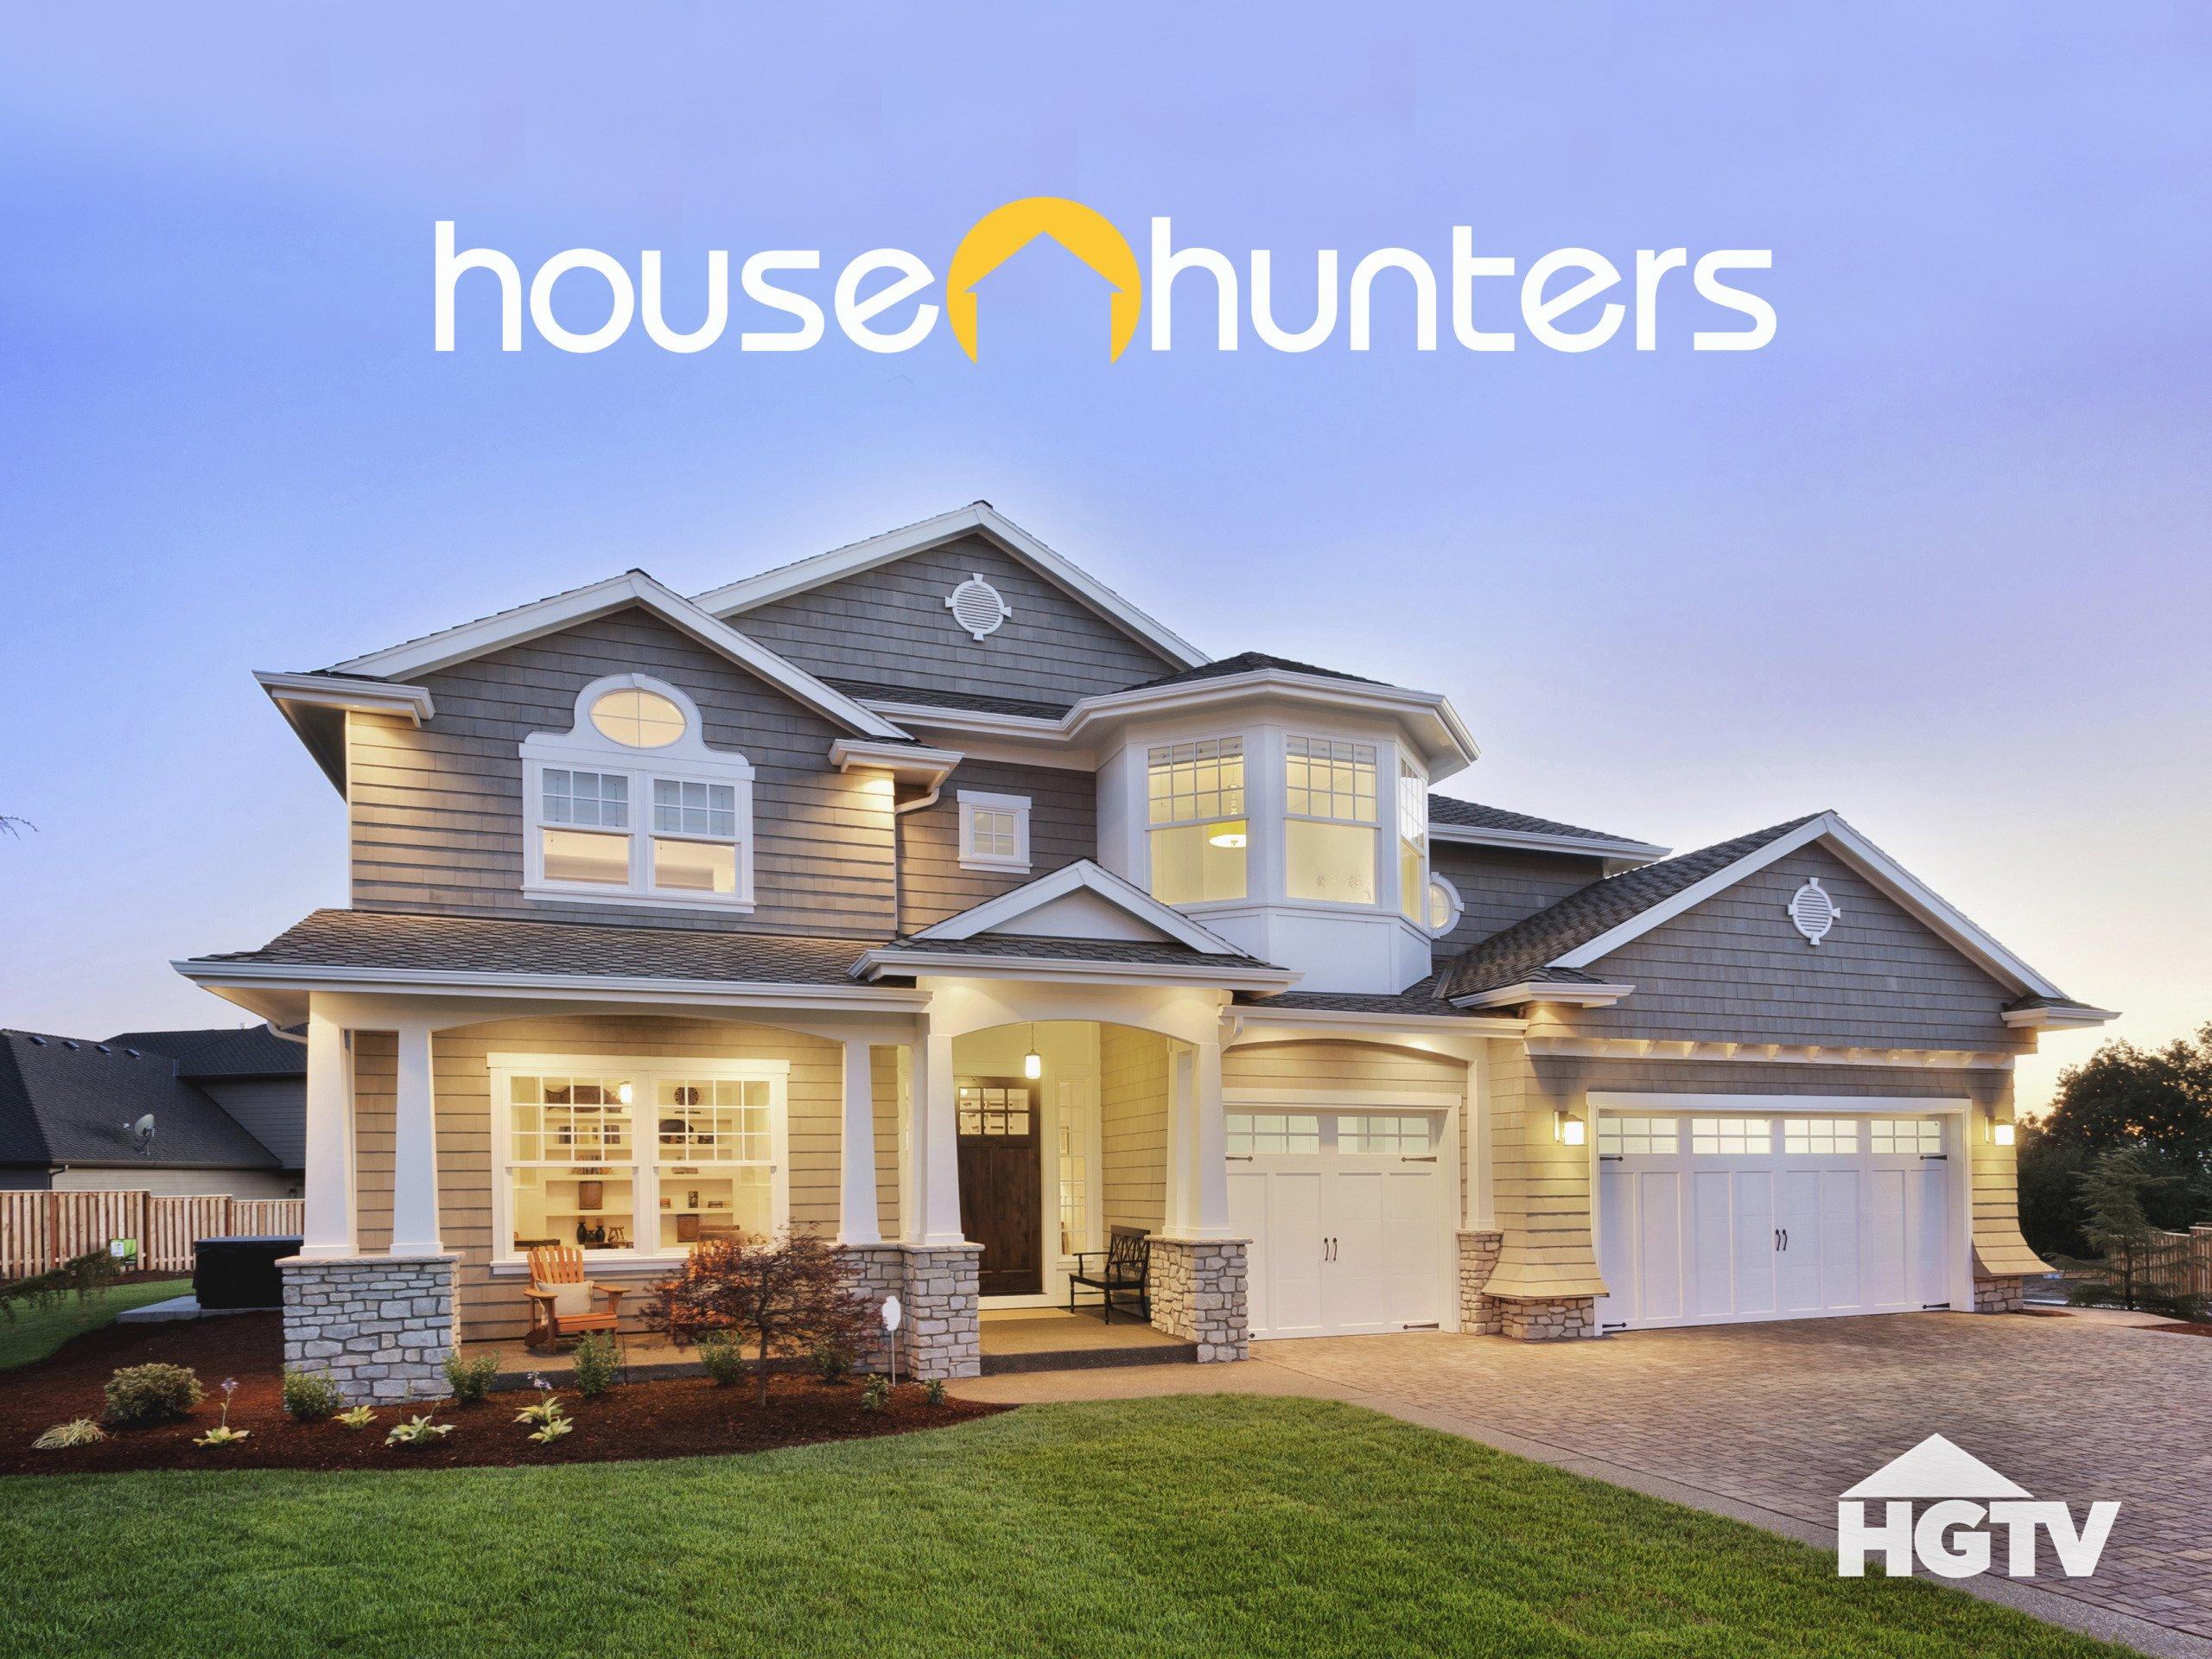 Amazon.com: Watch House Hunters Season 64 | Prime Video